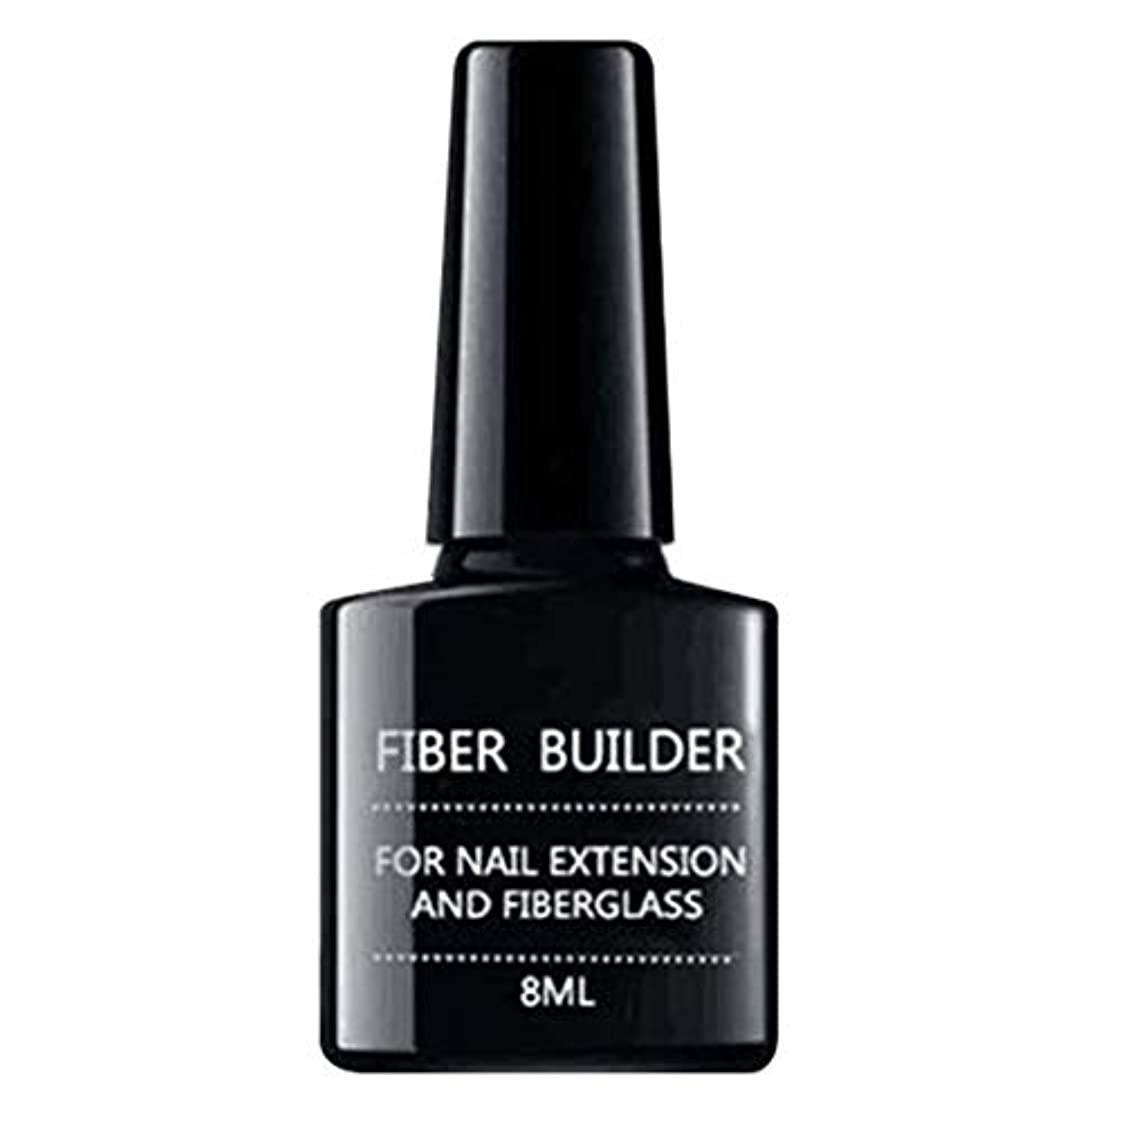 失望悪因子繁殖Fiberglass Nail Extension Set, Strong Adhesion Acrylic Tips Home Salon Manicure Tool, Quick Extension Fiberglass Nails Strips False Nails Manicure Salon Tool Accessories